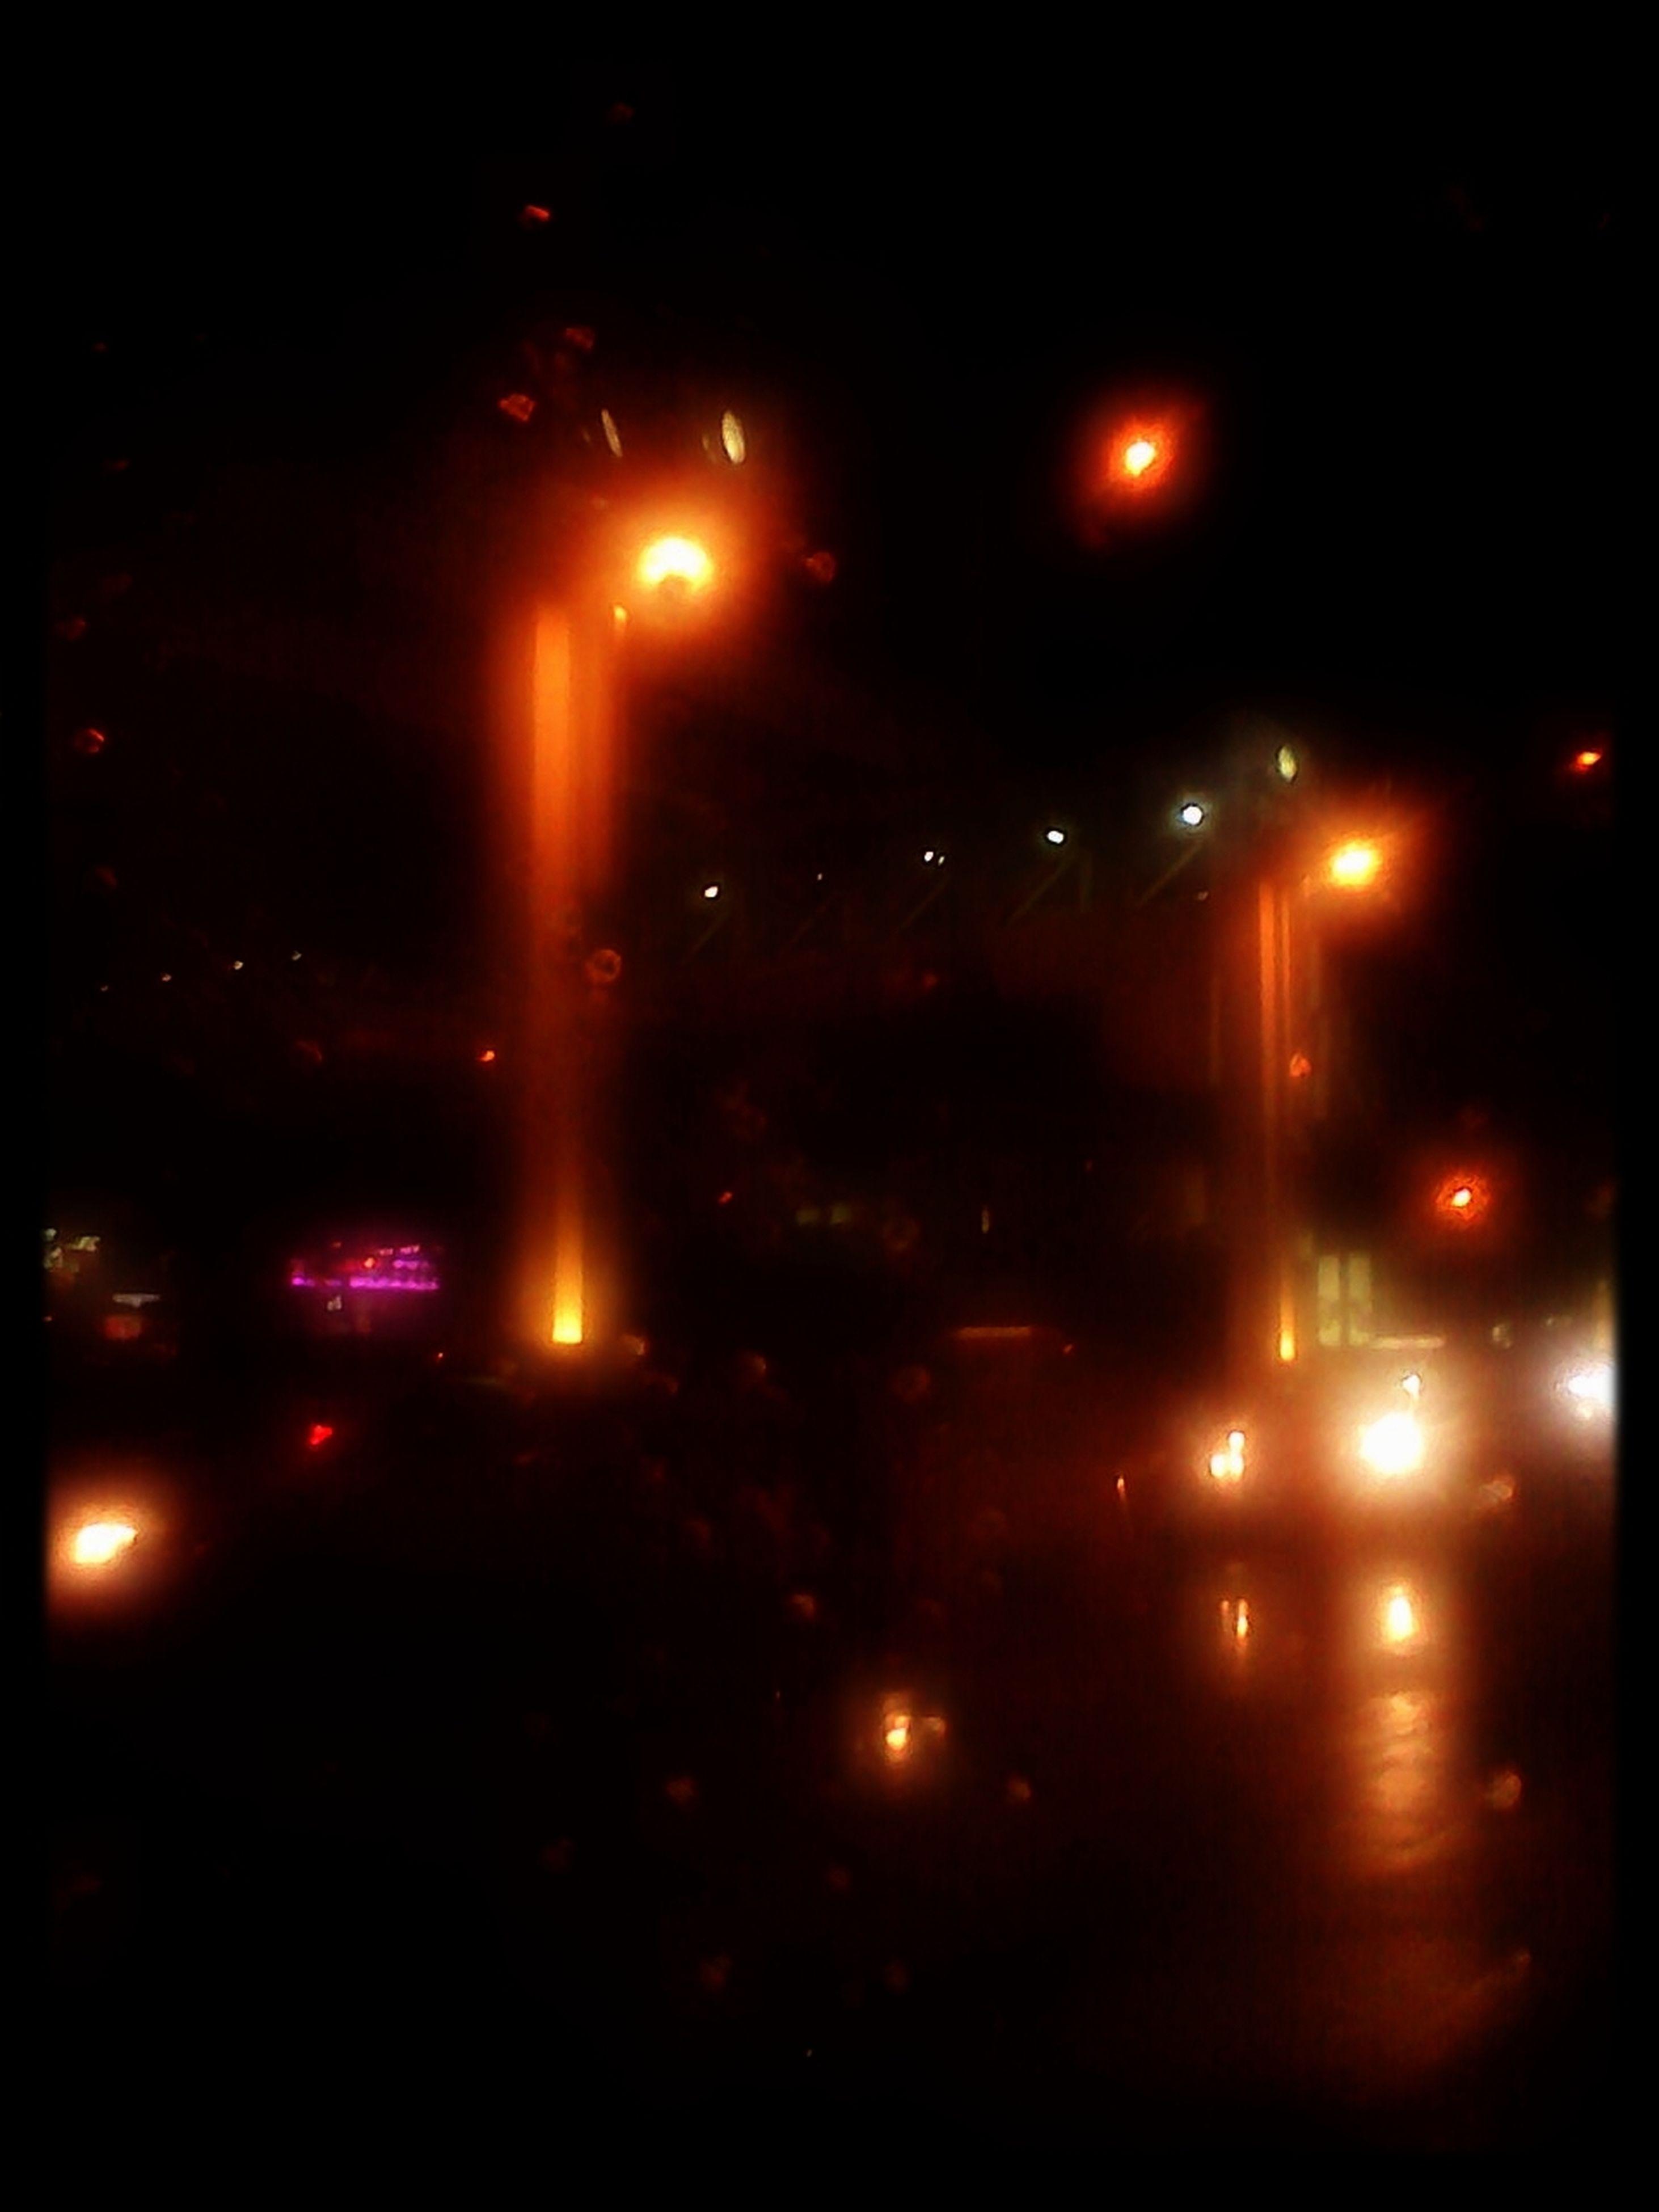 illuminated, night, street light, transportation, car, street, lighting equipment, land vehicle, road, city, dark, sky, mode of transport, light - natural phenomenon, city street, traffic, long exposure, building exterior, motion, outdoors